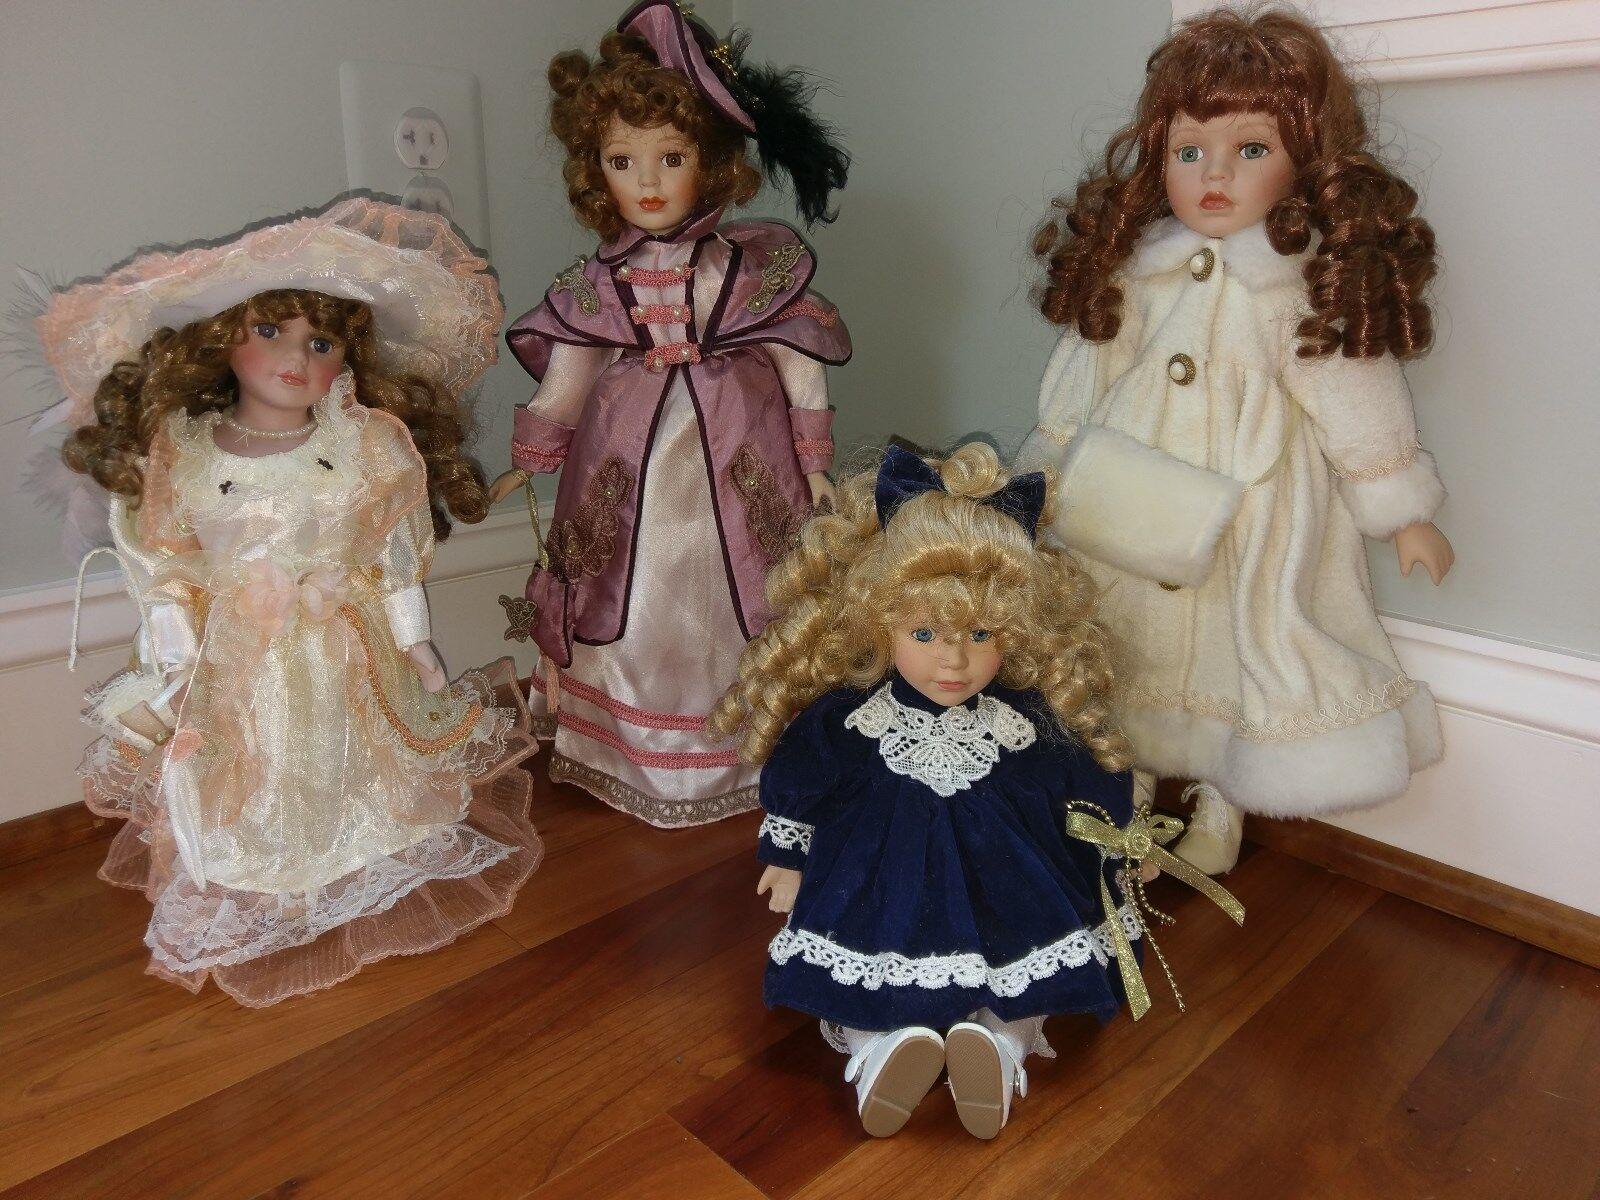 Lot 4 Porcelain Collector's Doll Paul Sebastian Dan Dee Windup Music Box Clothes